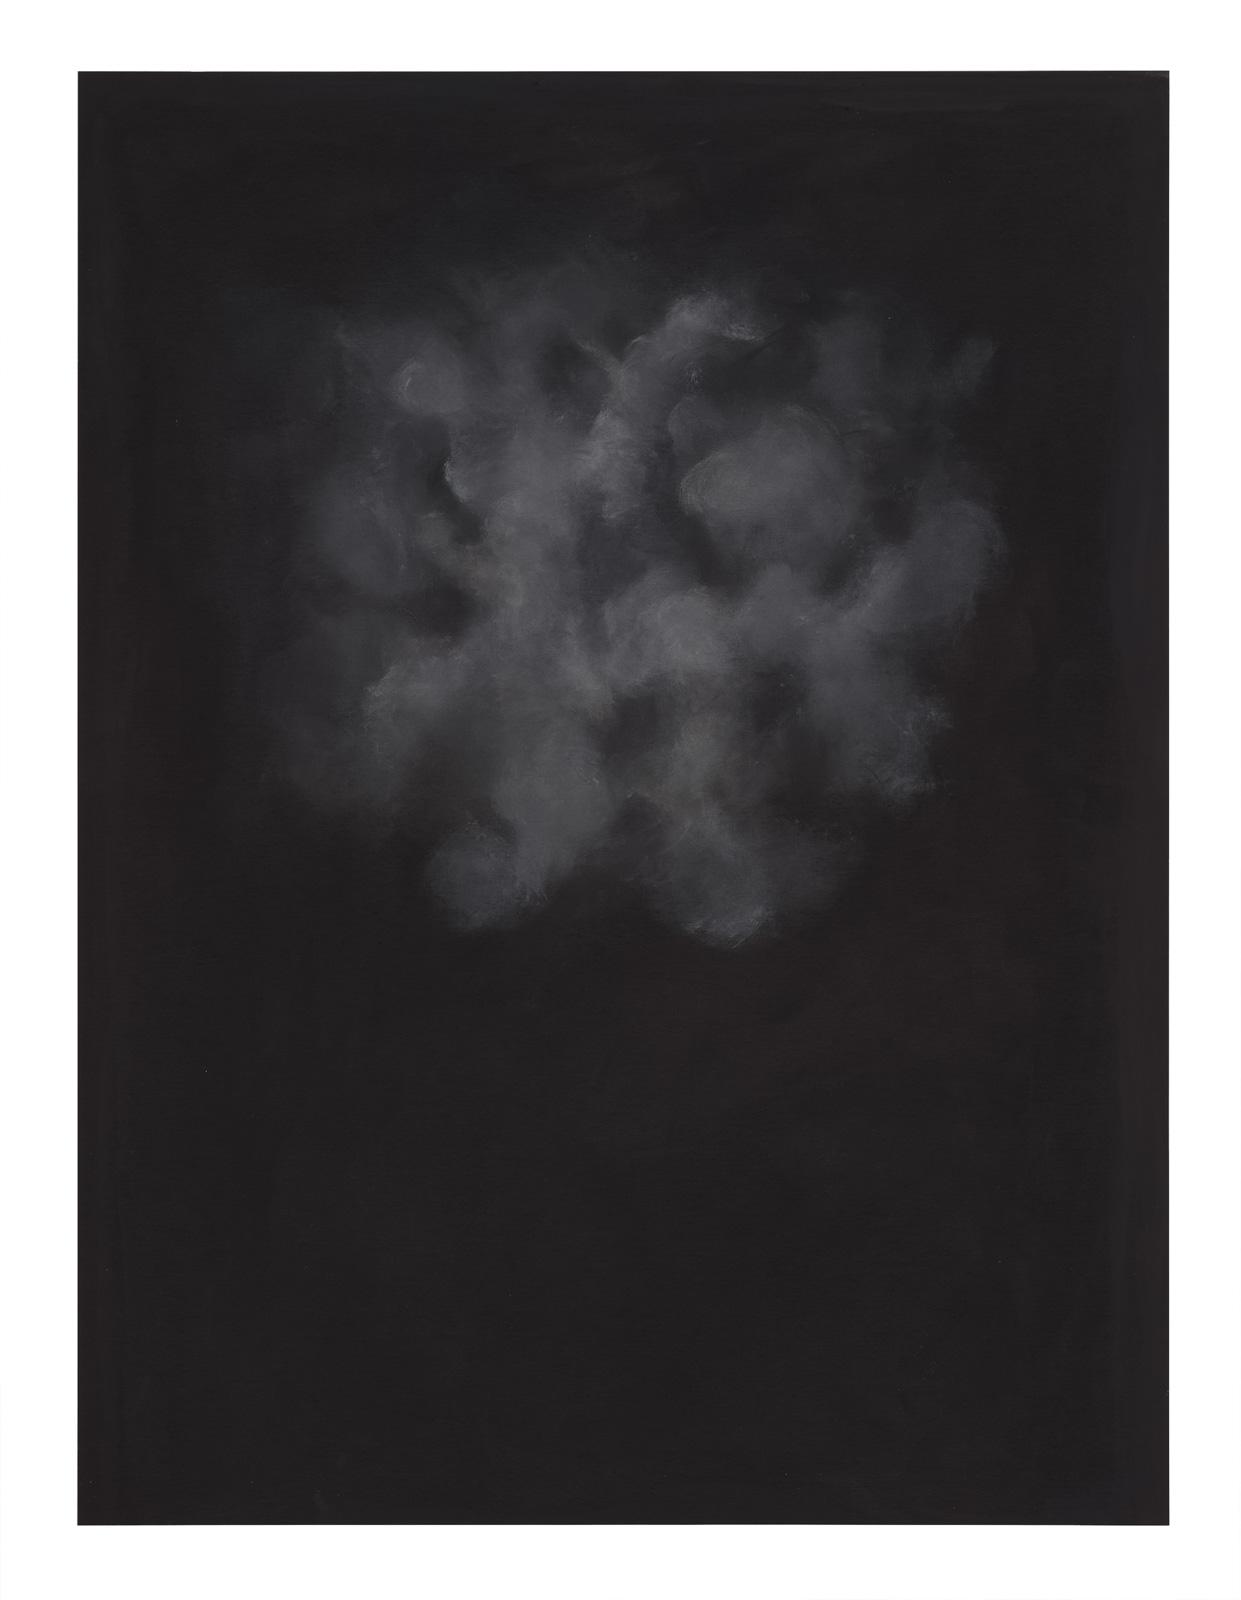 Sofia Ekström, Ouarry Mix Mottled Gray, 2017, Acrylic on canvas mounted on aluminium, 120 x 90 cm